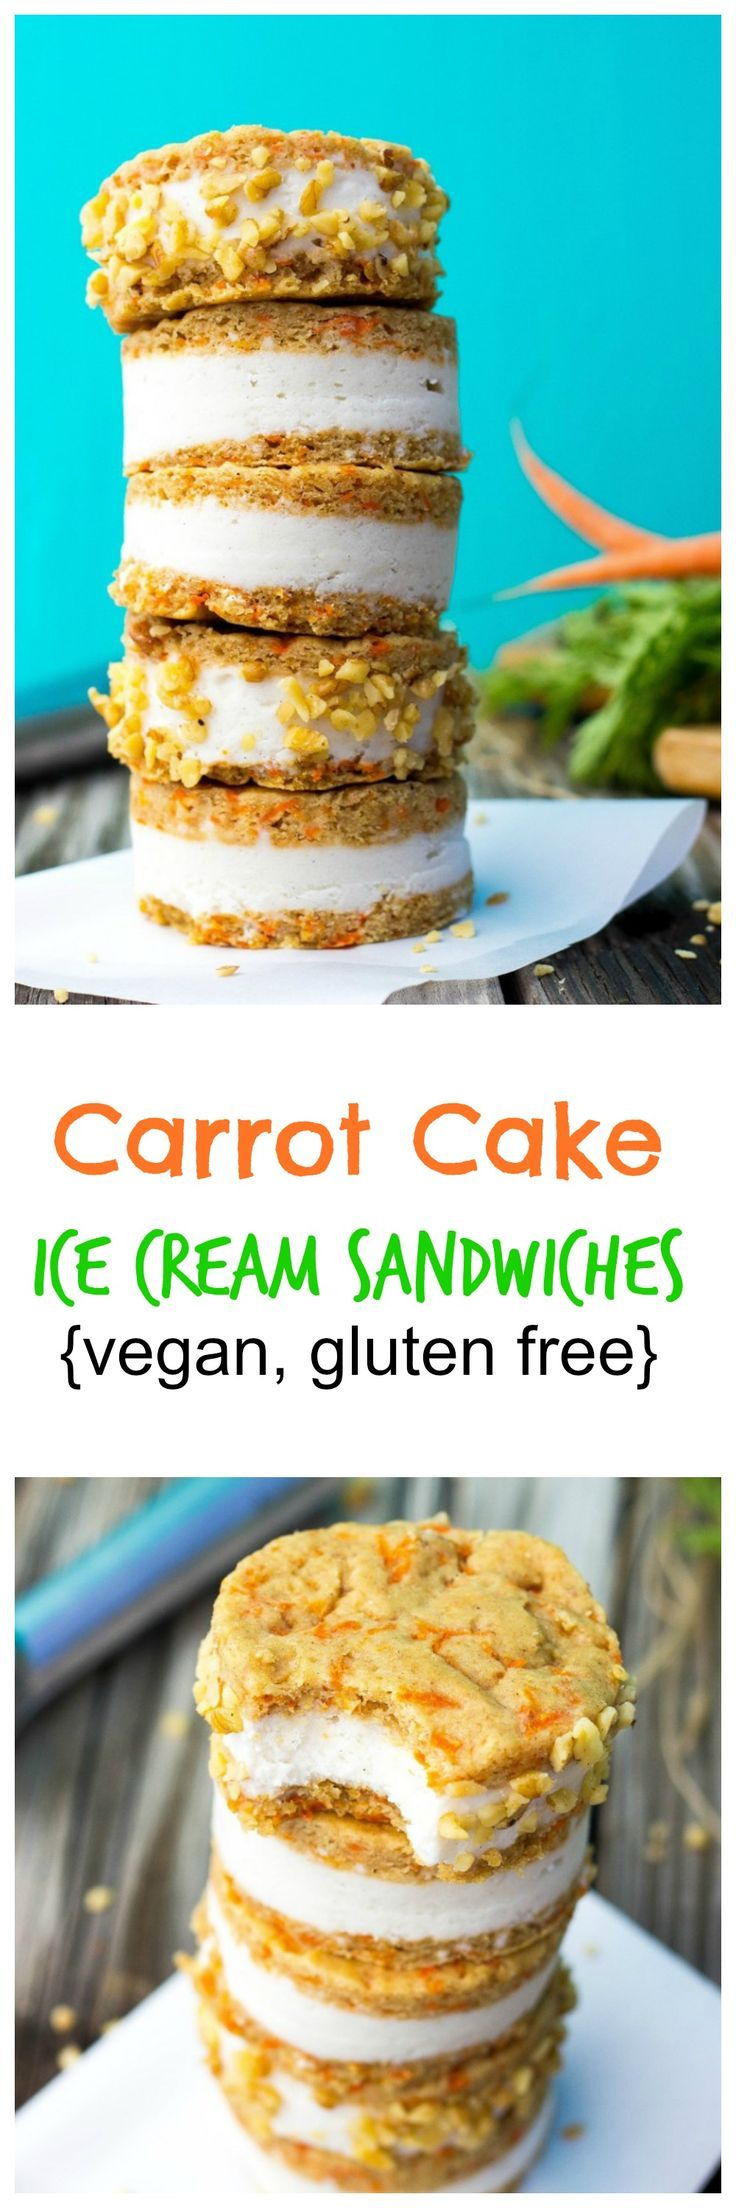 Carrot Cake Ice Cream Sandwiches (vegan & gluten free)